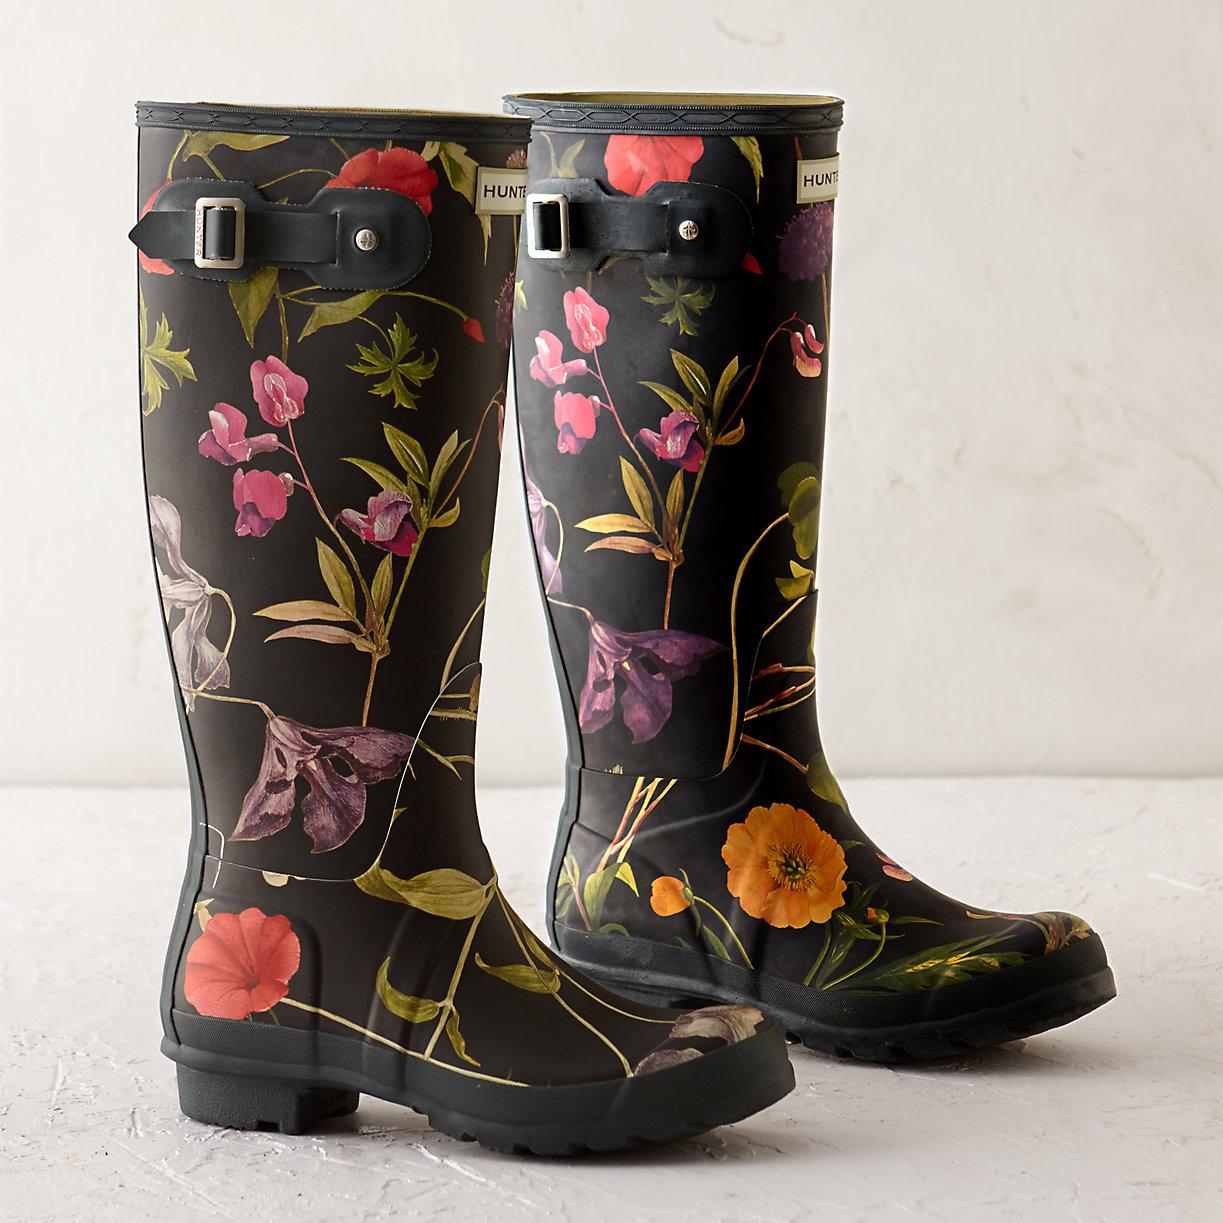 Floral Garden Boots